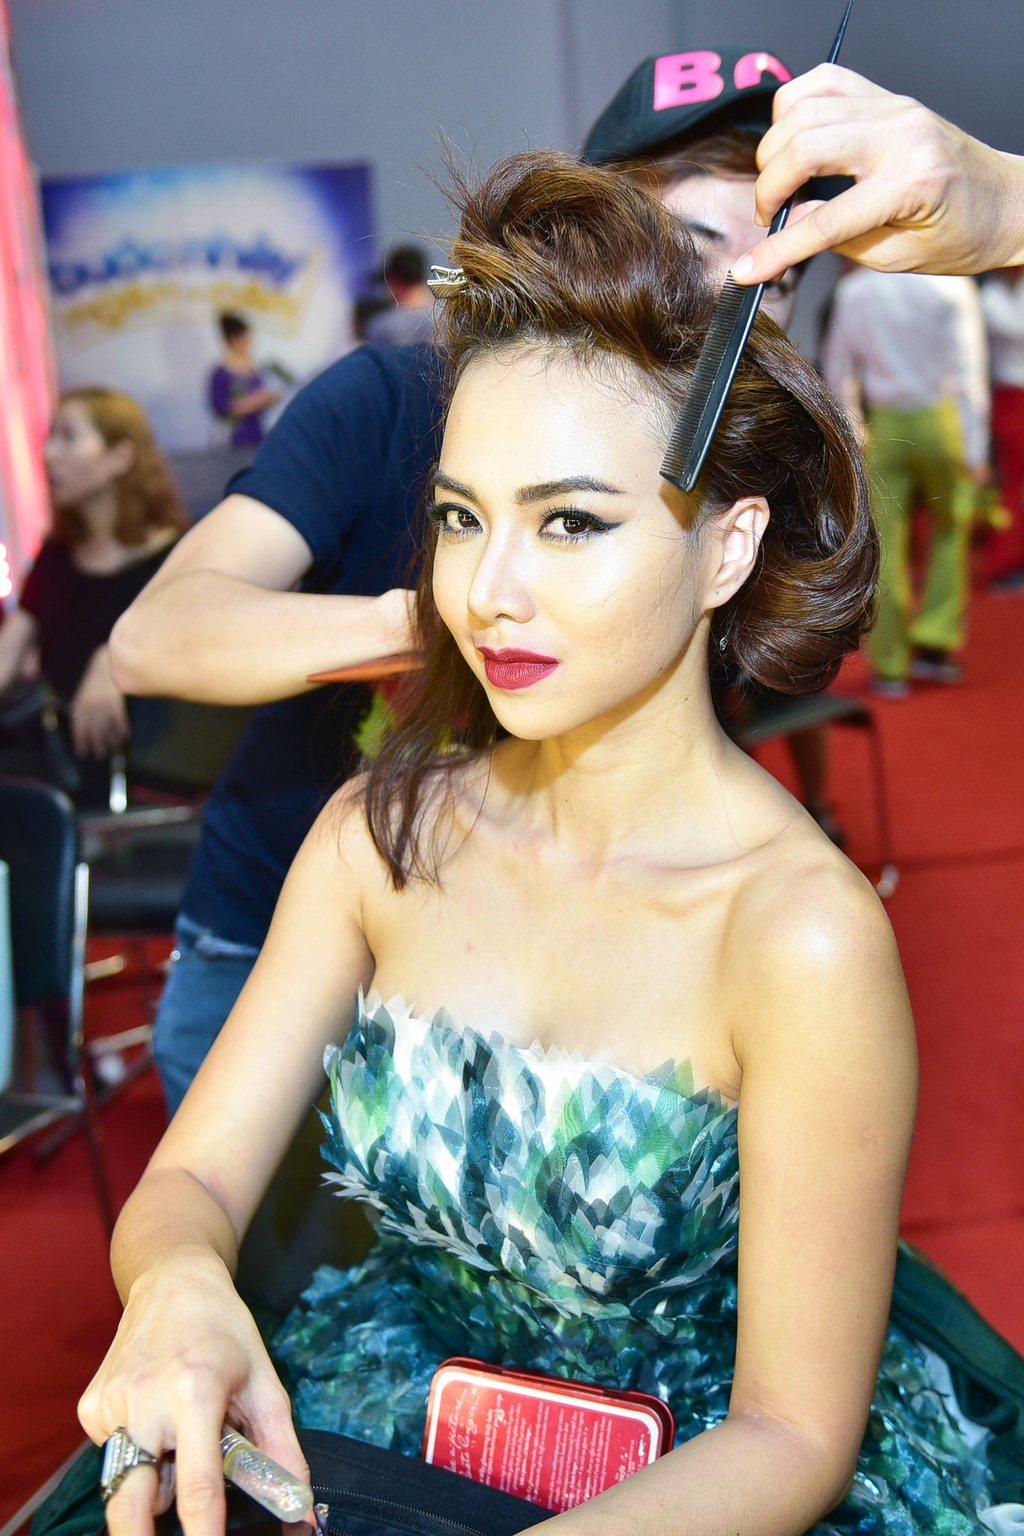 Truong Giang tuoi tan trong canh ga Buoc nhay ngan can hinh anh 6